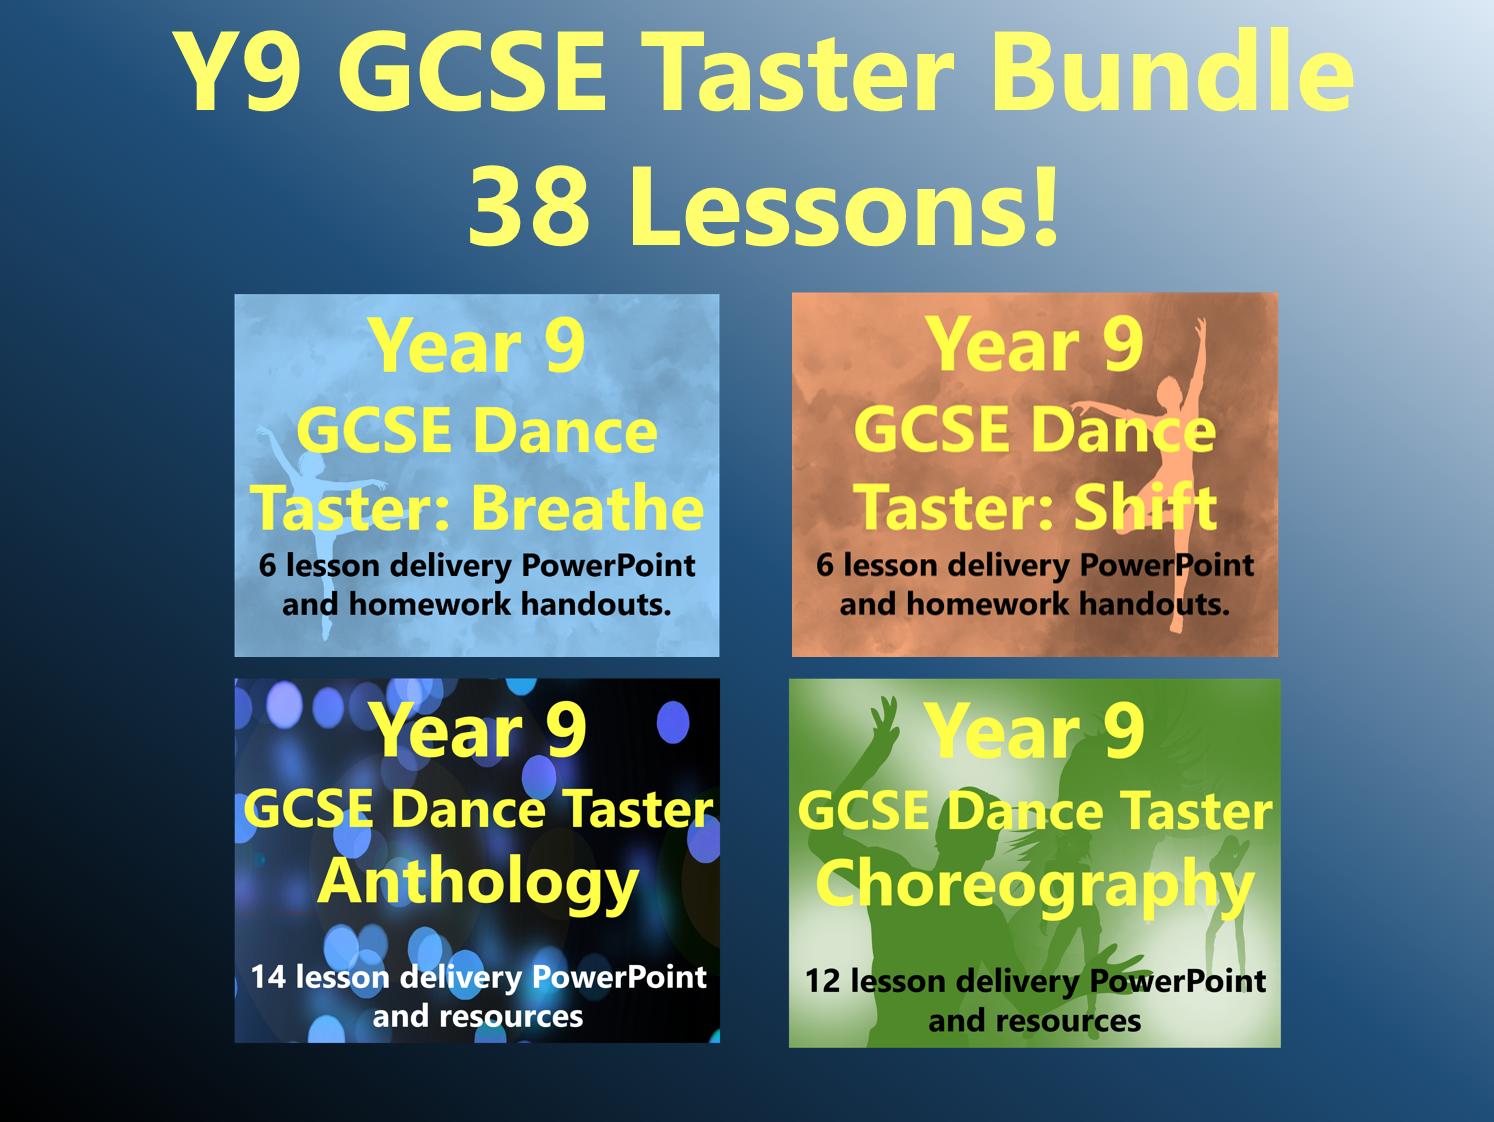 Year 9 GCSE Dance Taster Bundle (38 Lessons!)